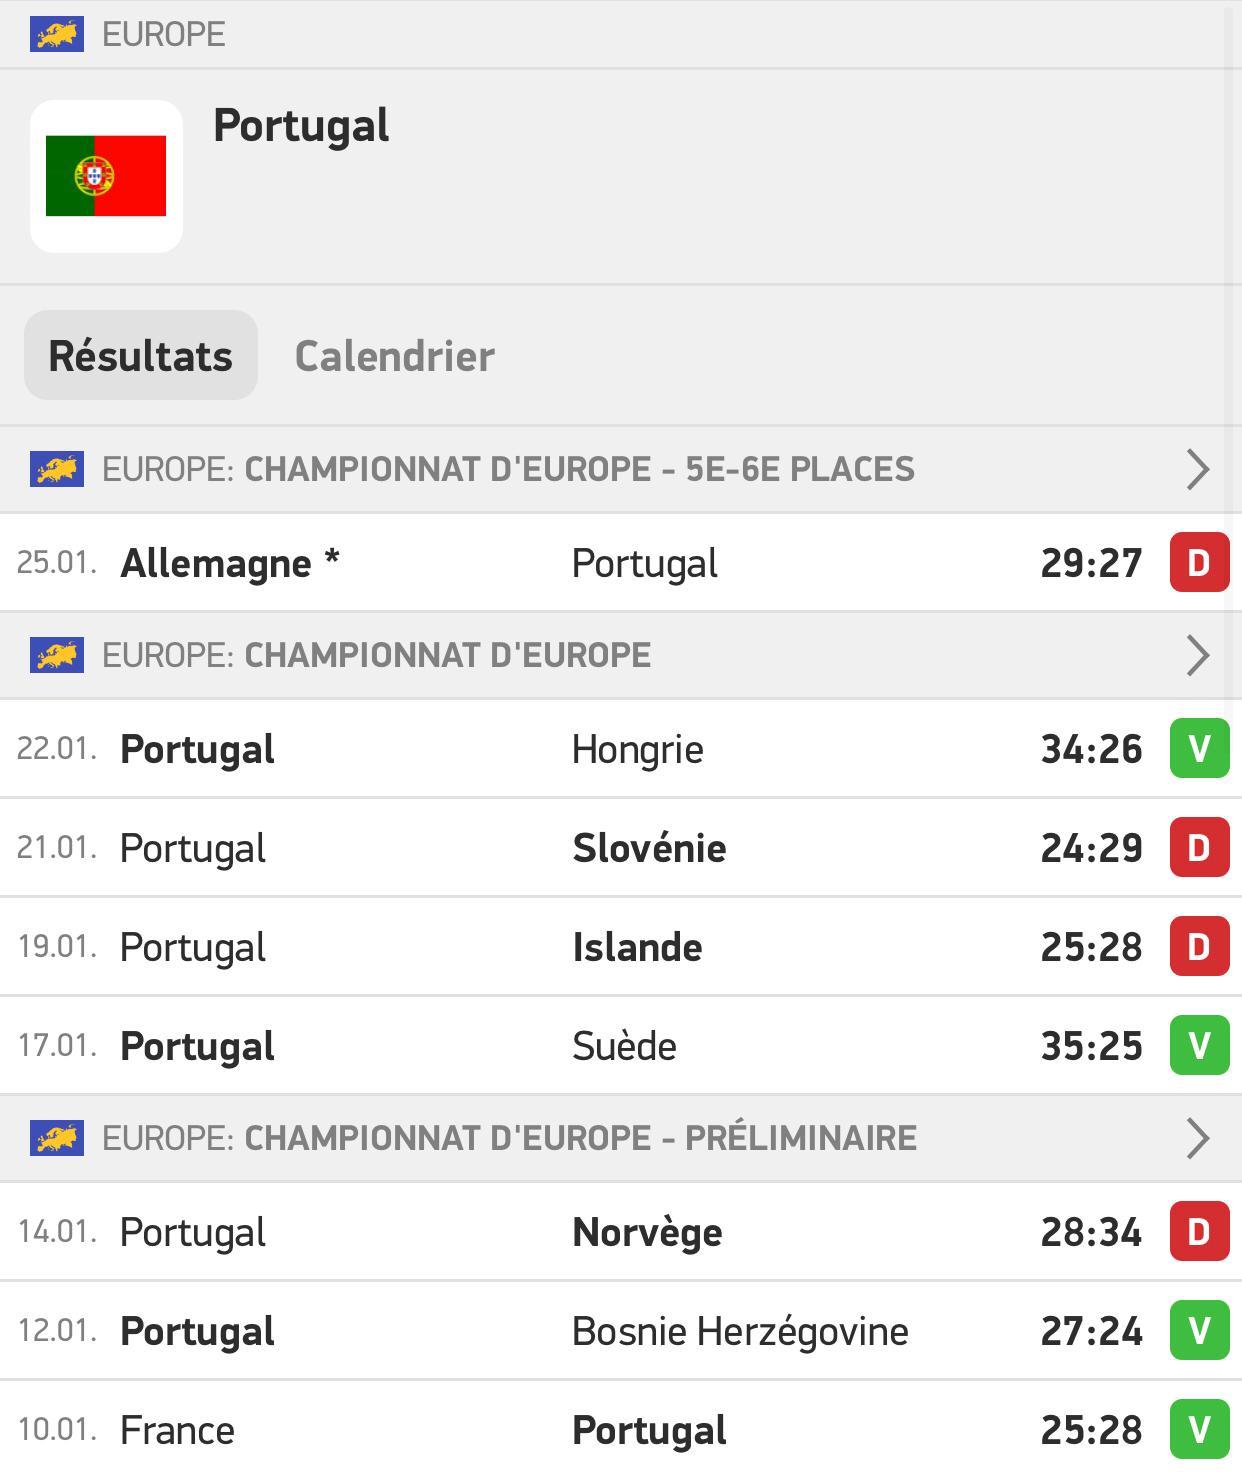 PORTUGAL_0001